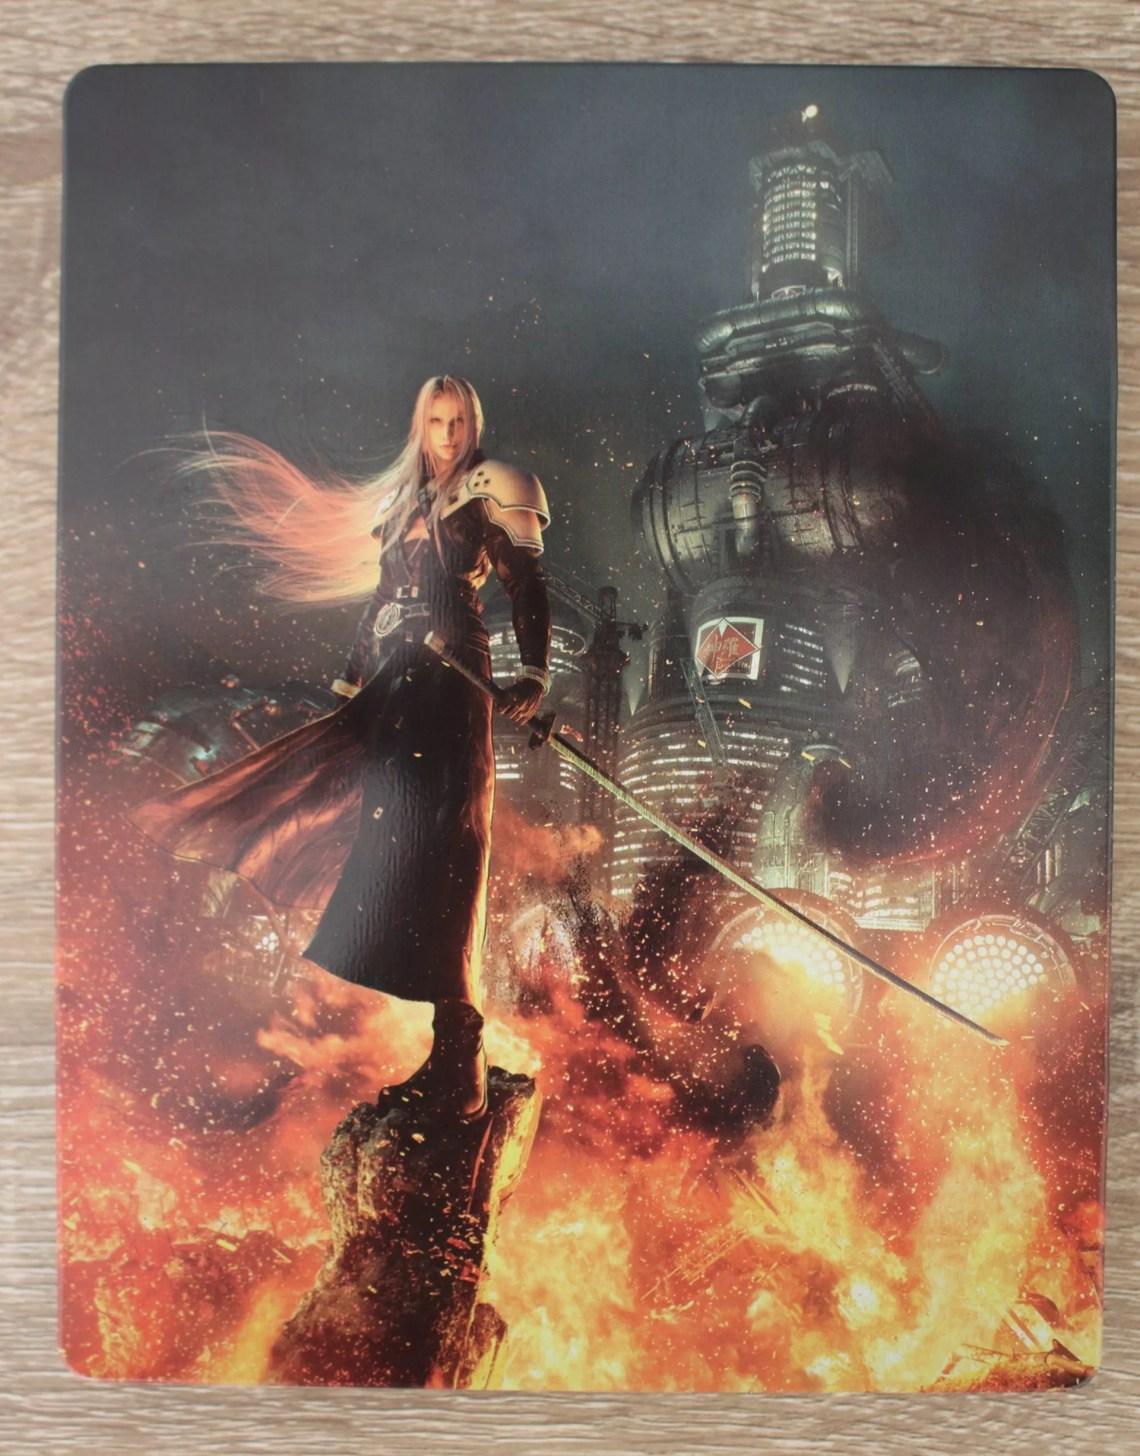 steelbook de Sephiroth (Final Fantasy VII Remake)